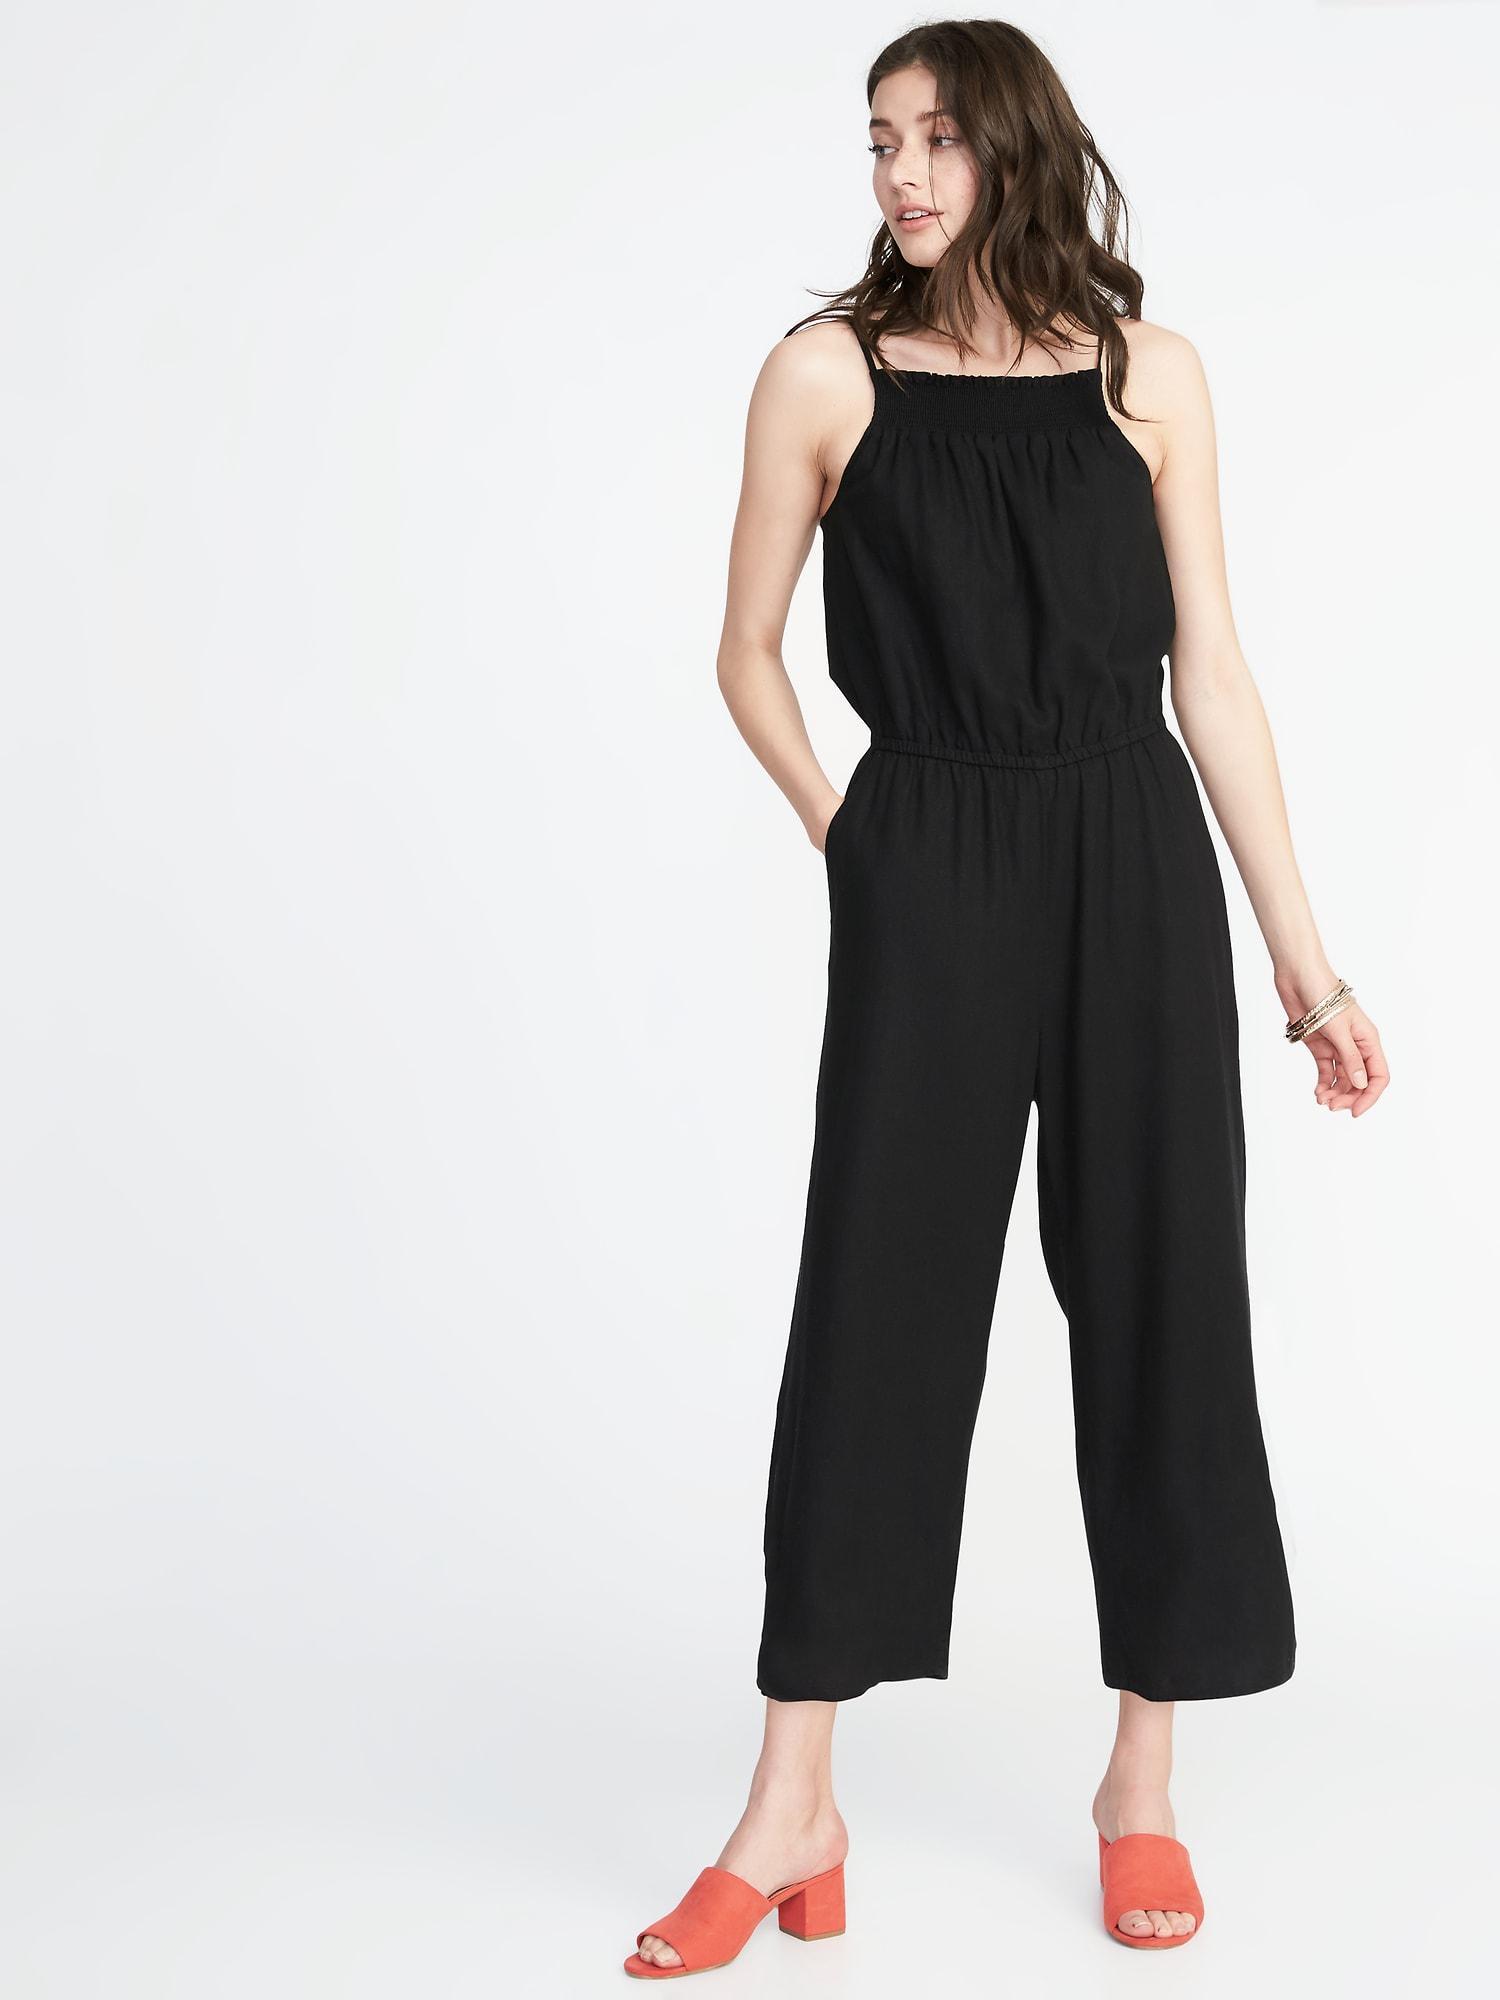 9306df9234f Lyst - Old Navy Waist-defined Sleeveless Linen-blend Jumpsuit in Black